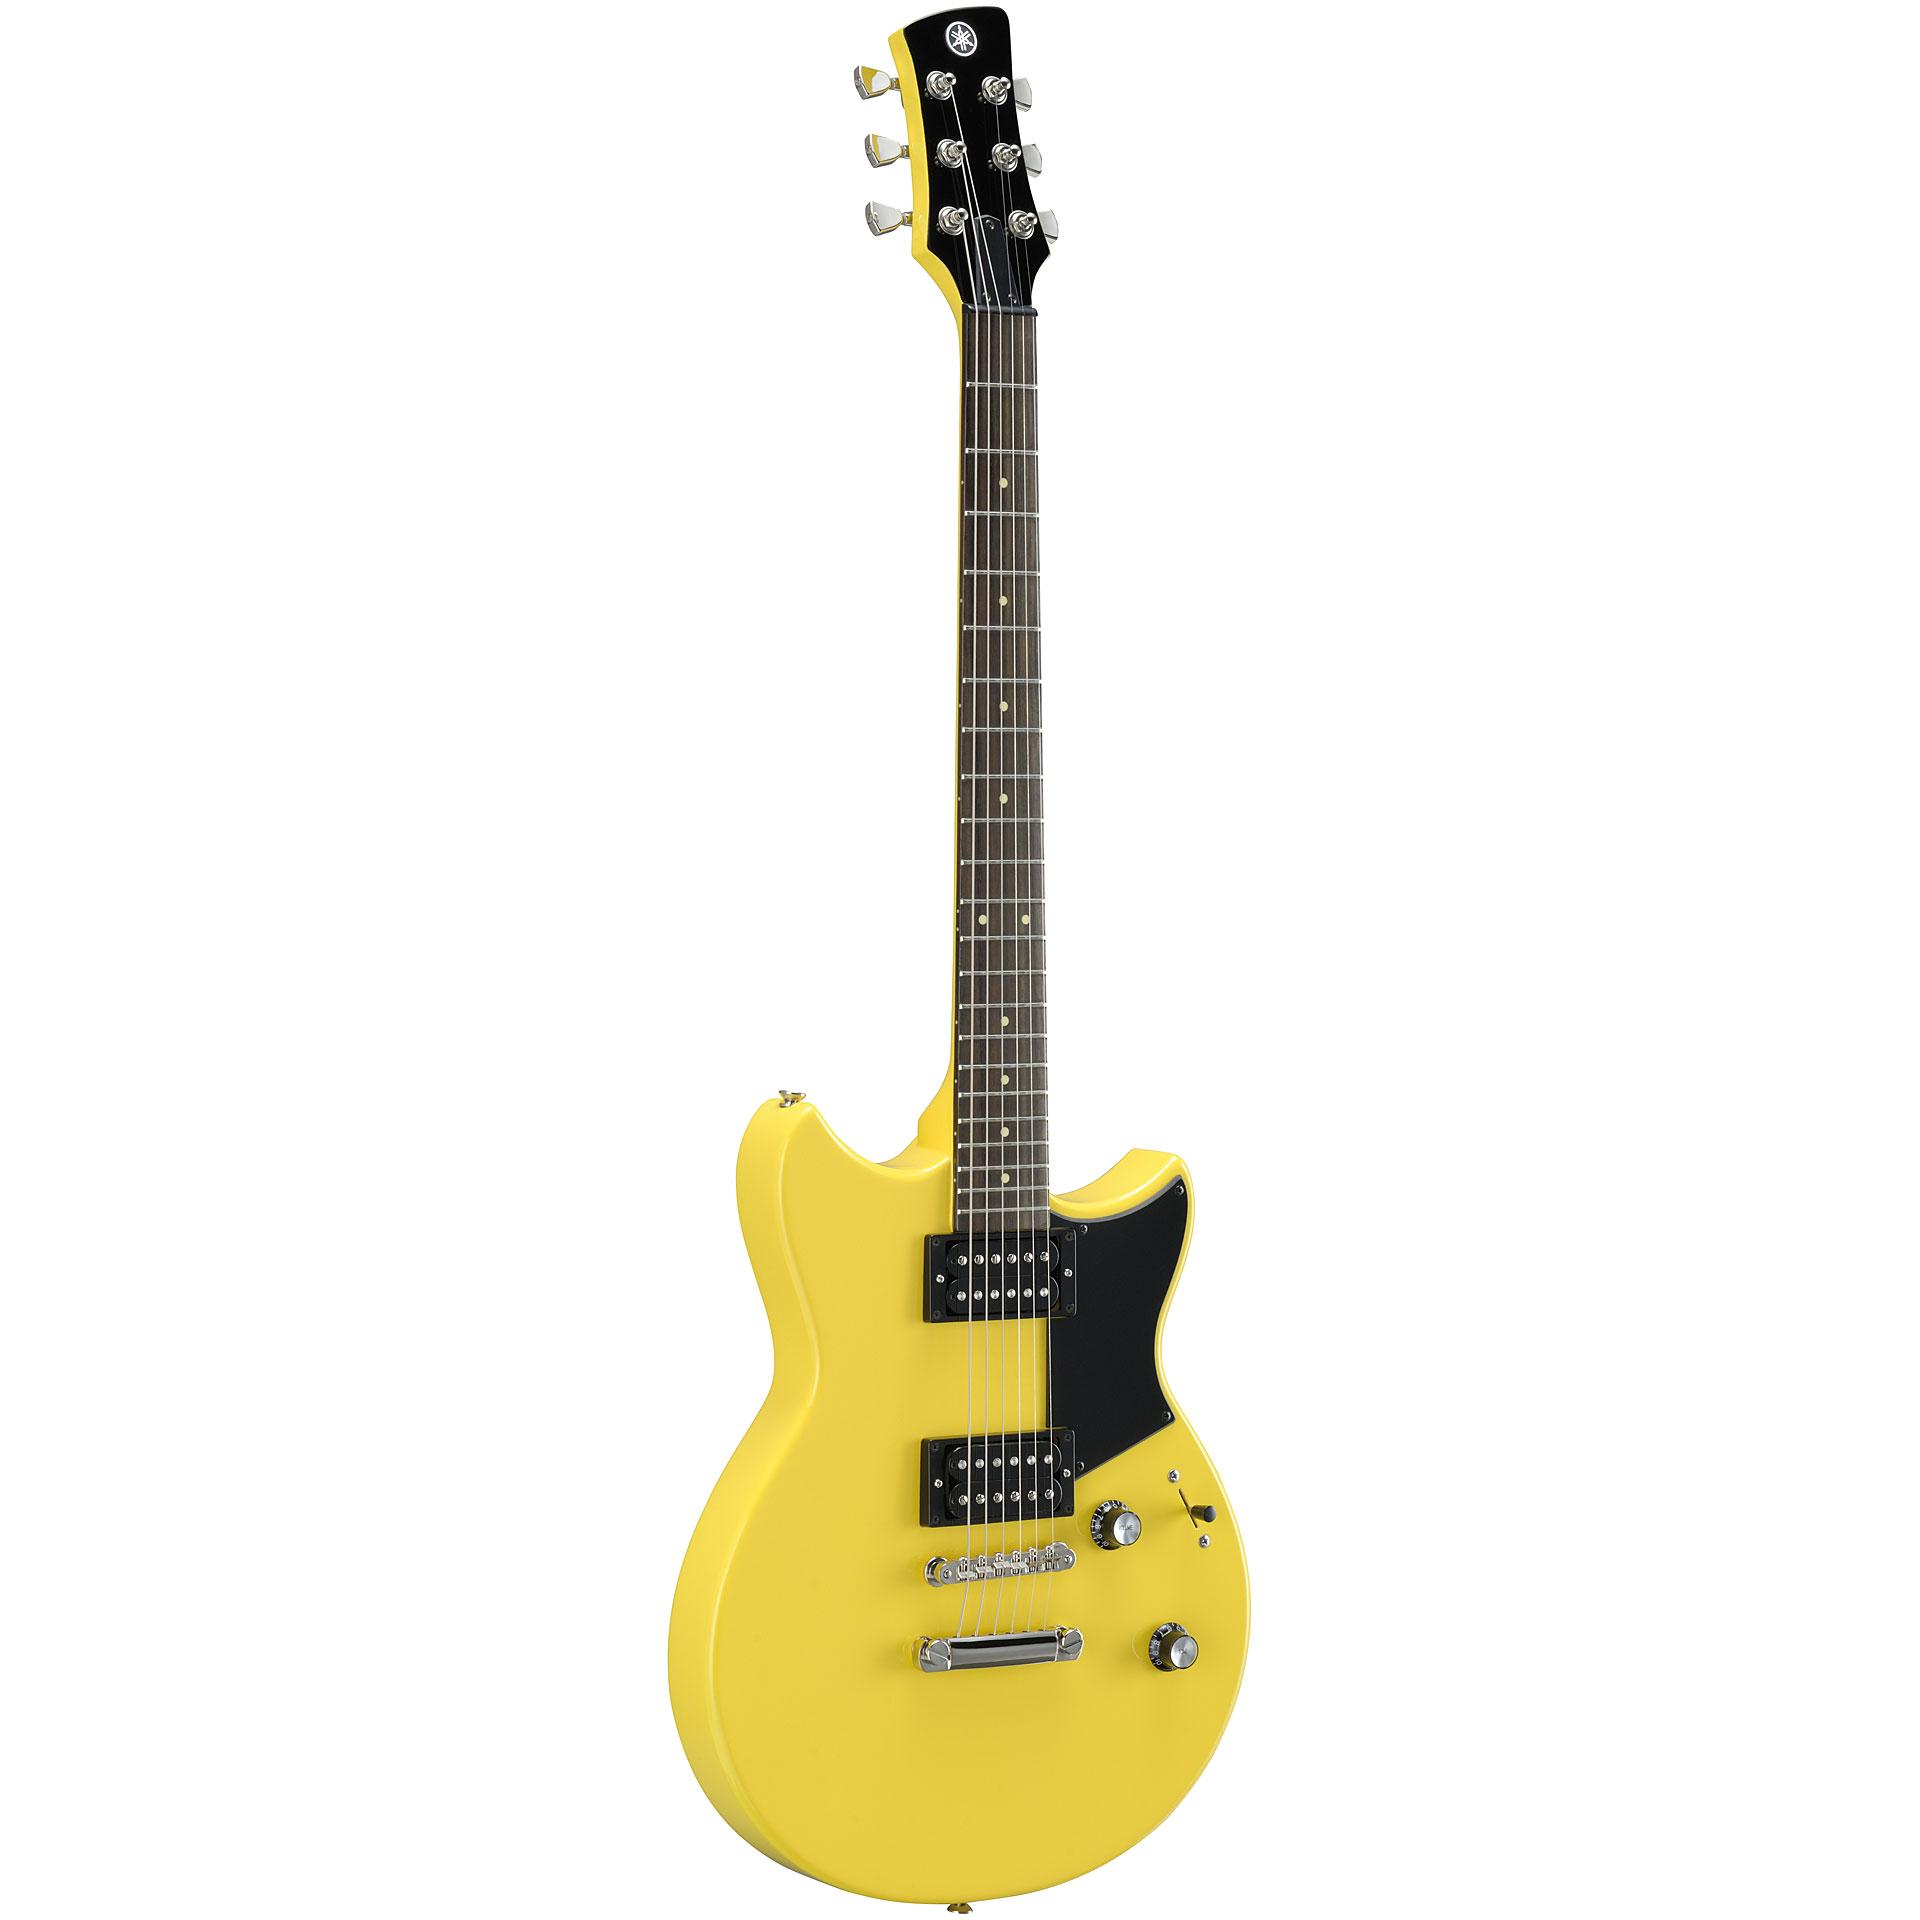 Yamaha Revstar Rs320 Syl Electric Guitar Technology Pinterest Circuit And Html